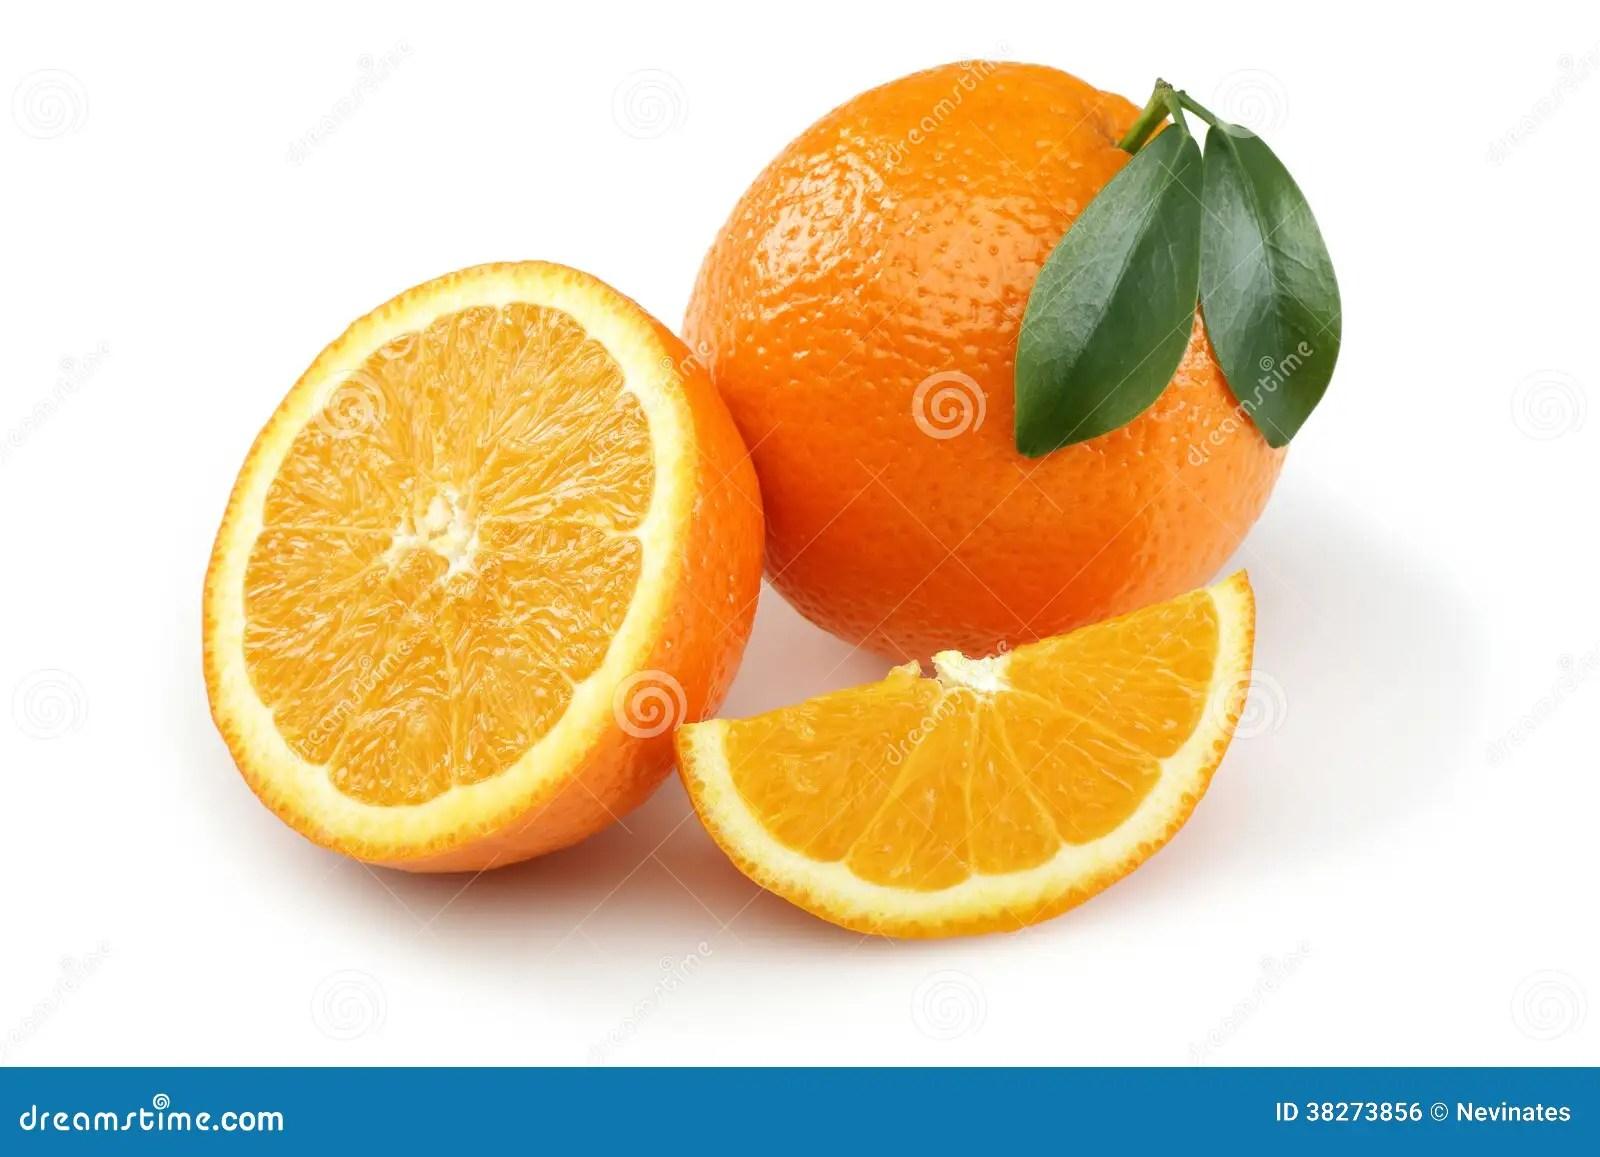 Half Orange And Orange Slice Royalty Free Stock Image